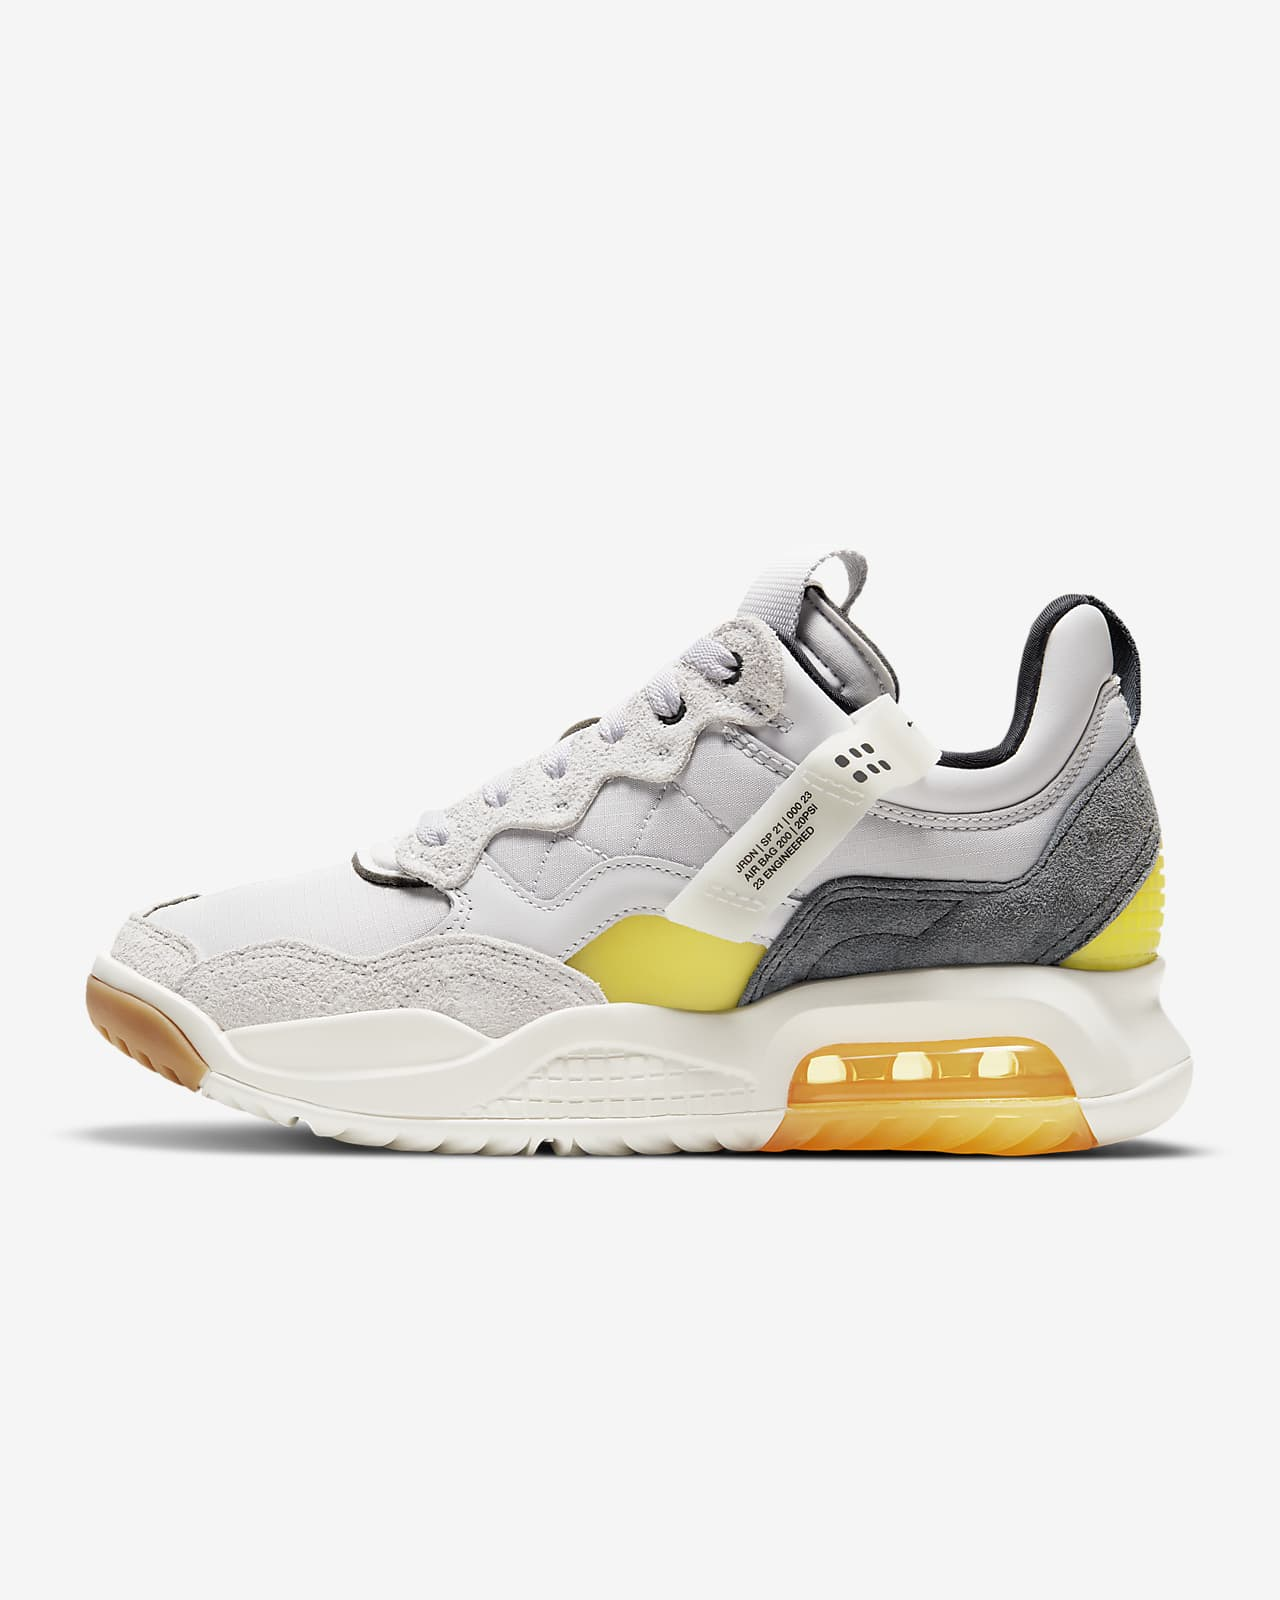 Chaussure Jordan MA2 « Lunar Launch » pour Femme. Nike CA